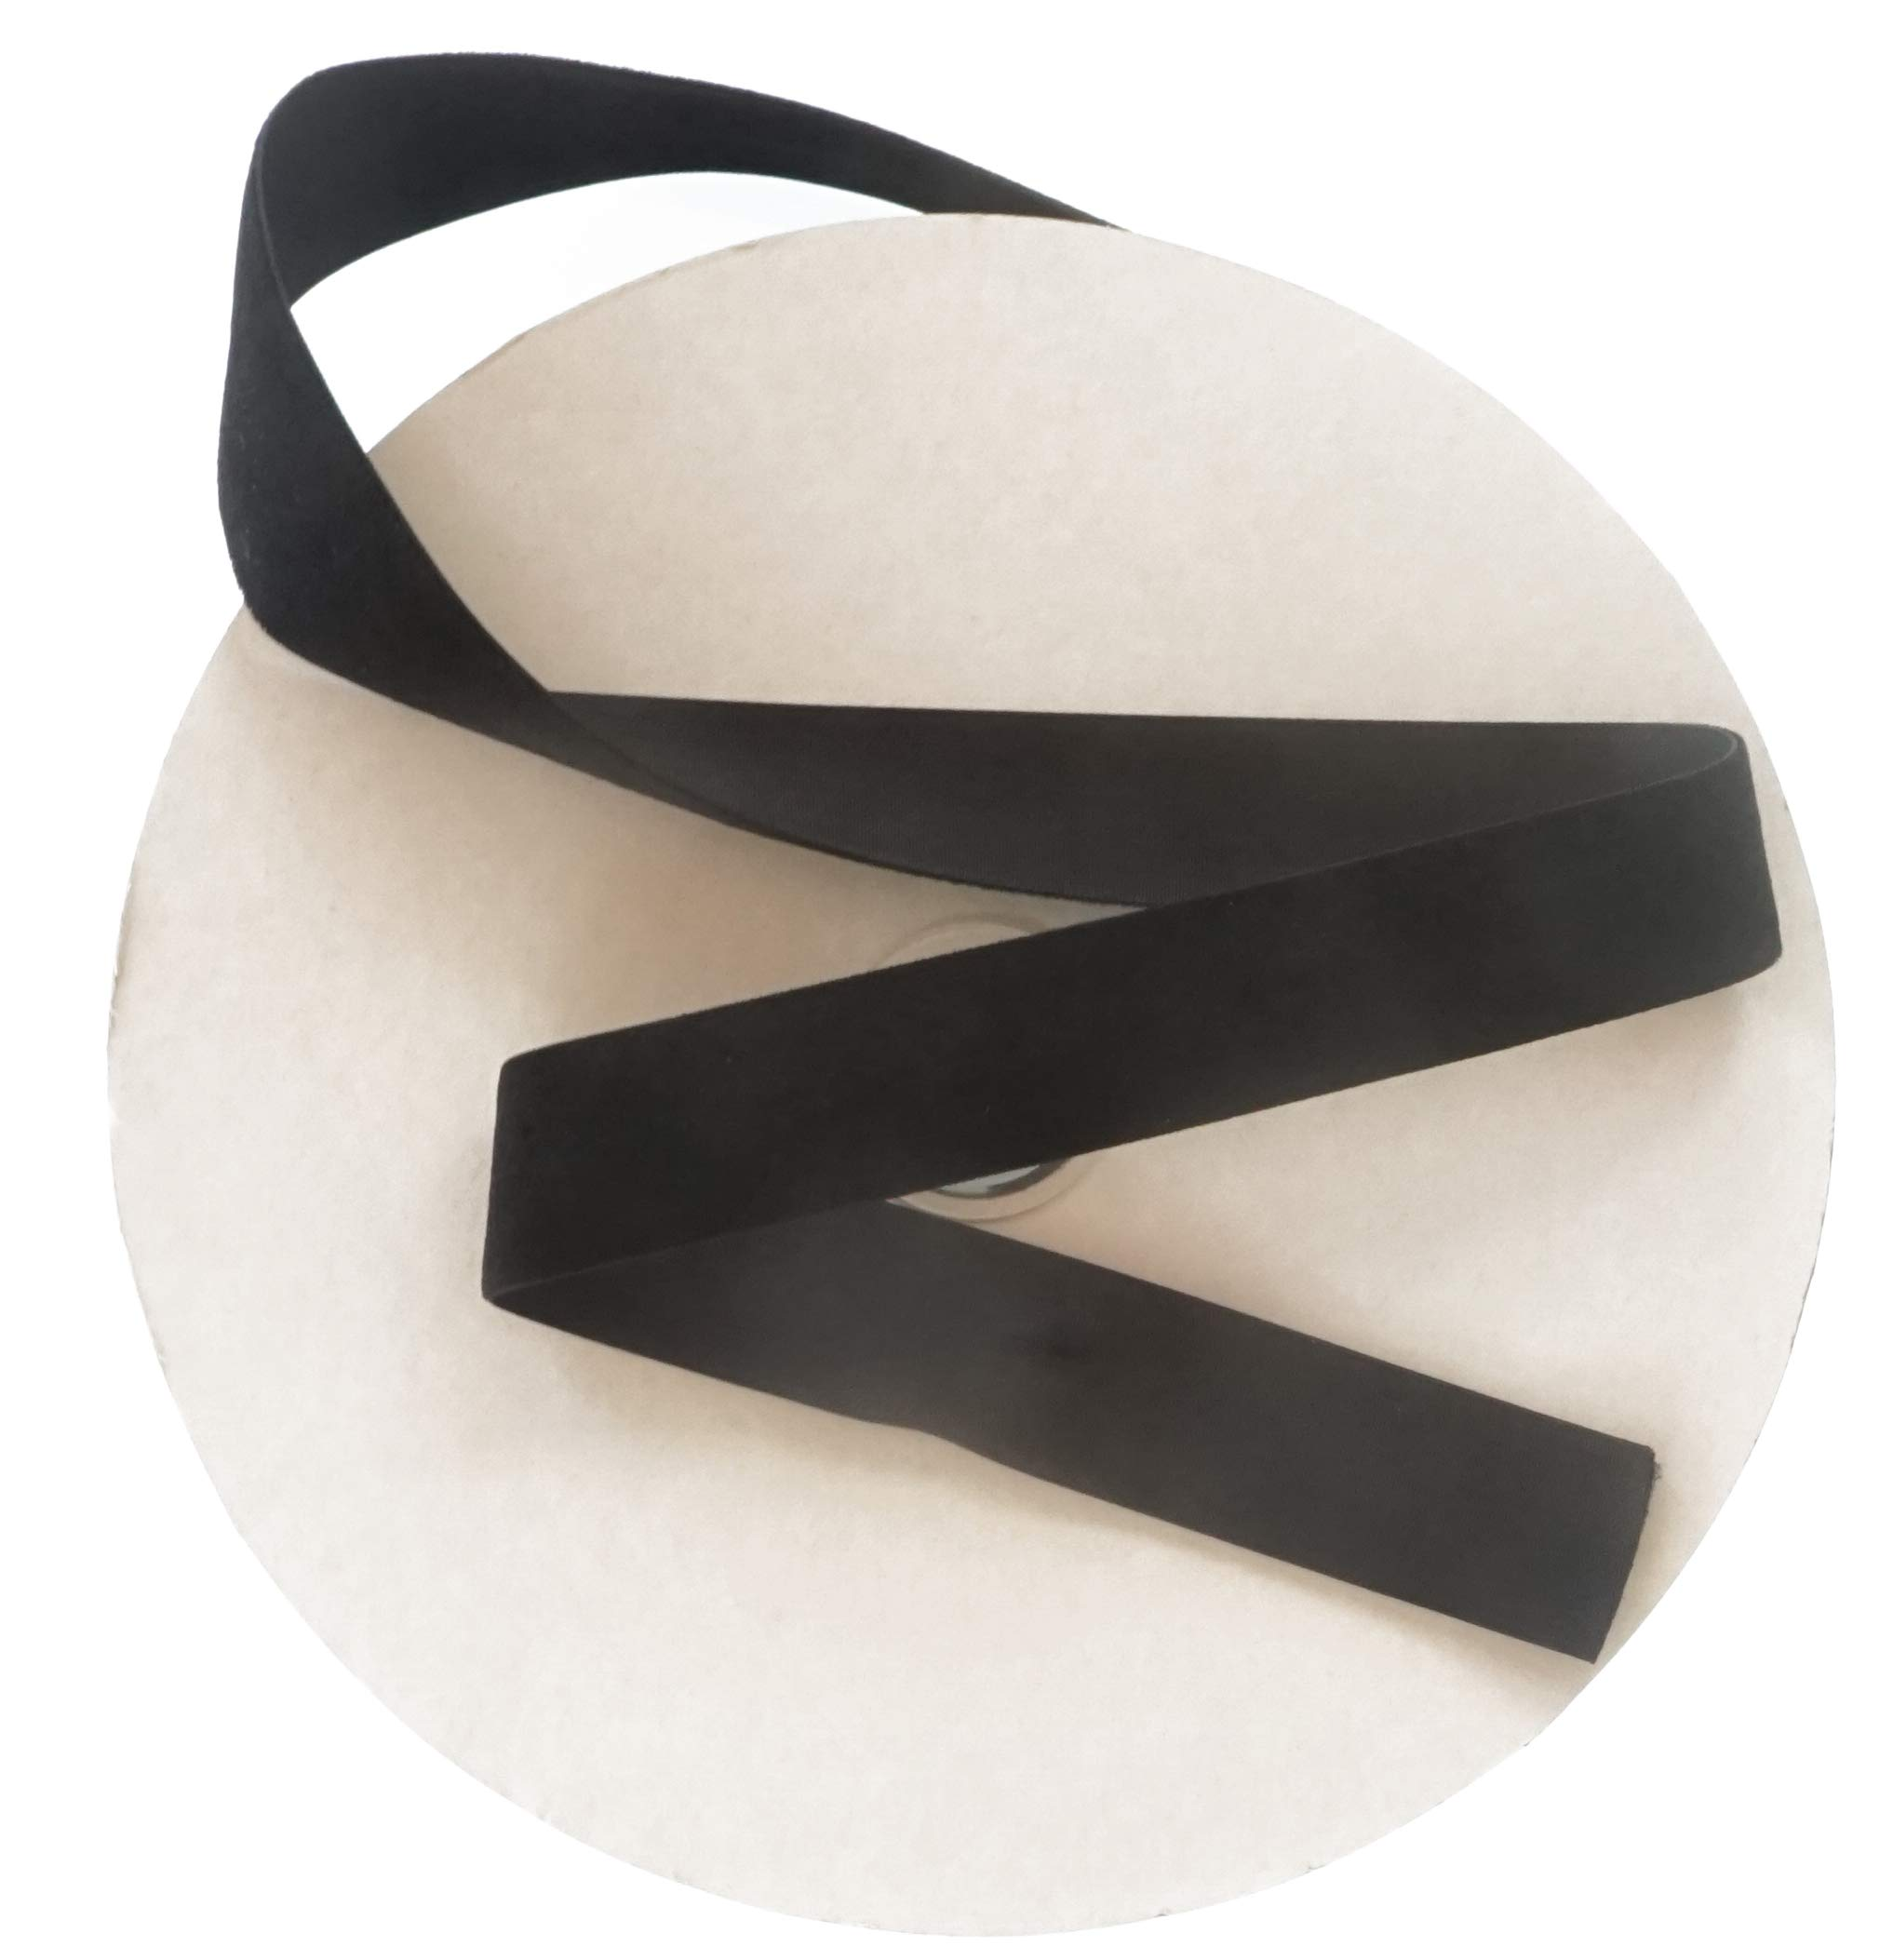 Black Velvet Ribbon by Drency. Huge 25 Yards Roll. 1 Inch Single Face Spool